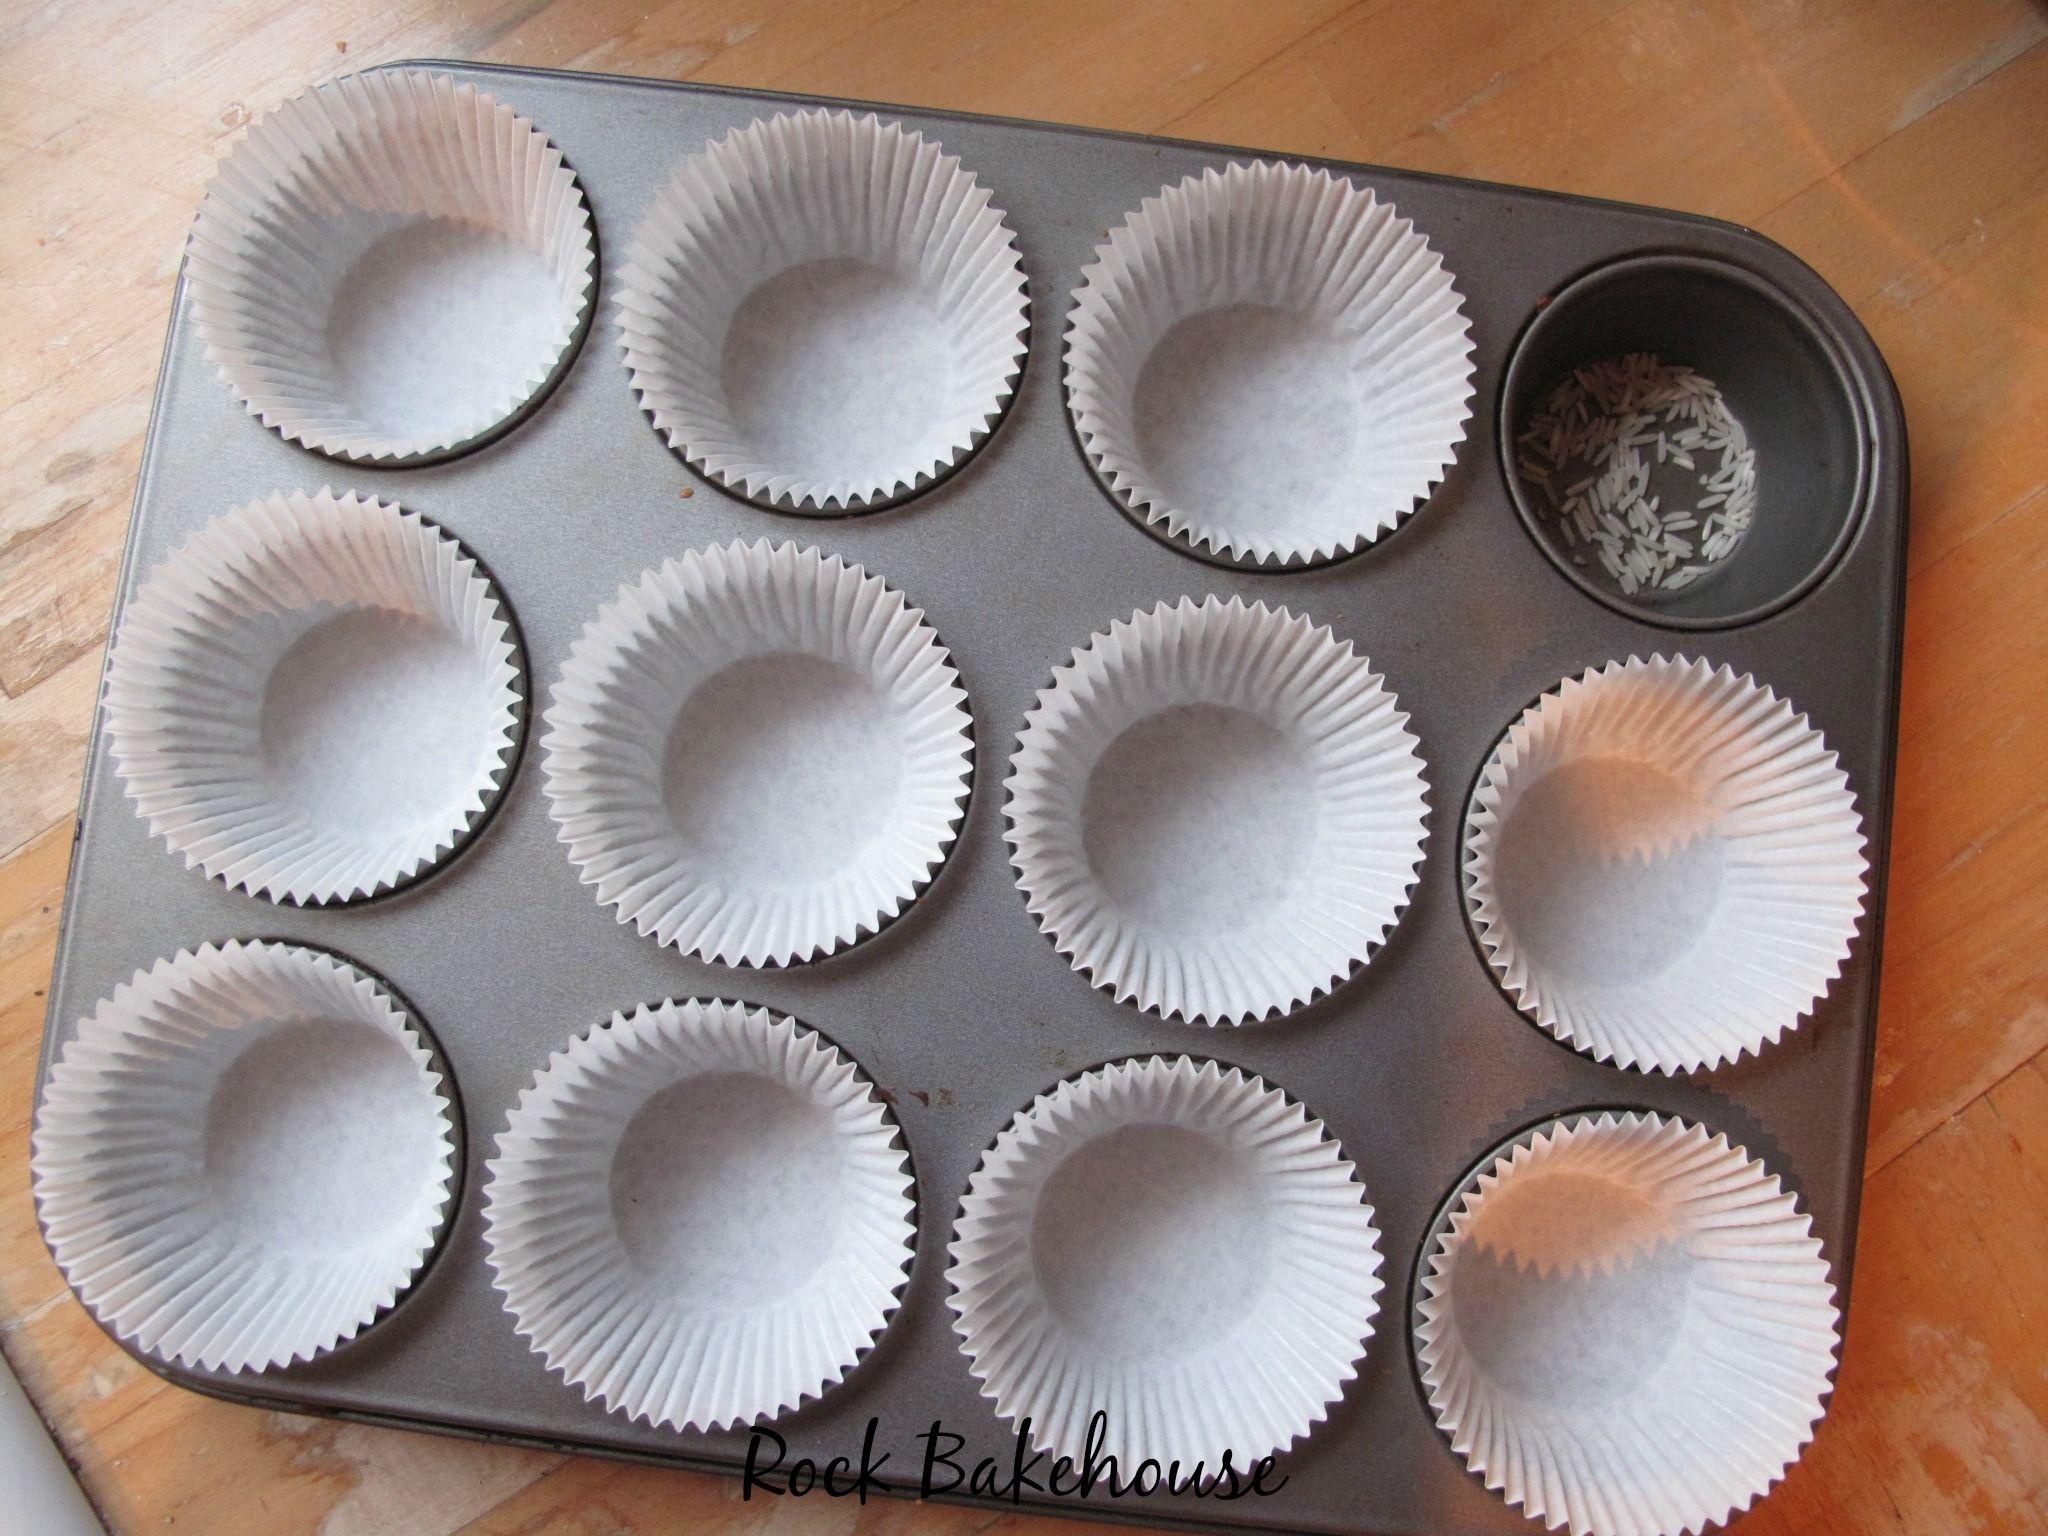 Preventing Greasy Cupcake Cases